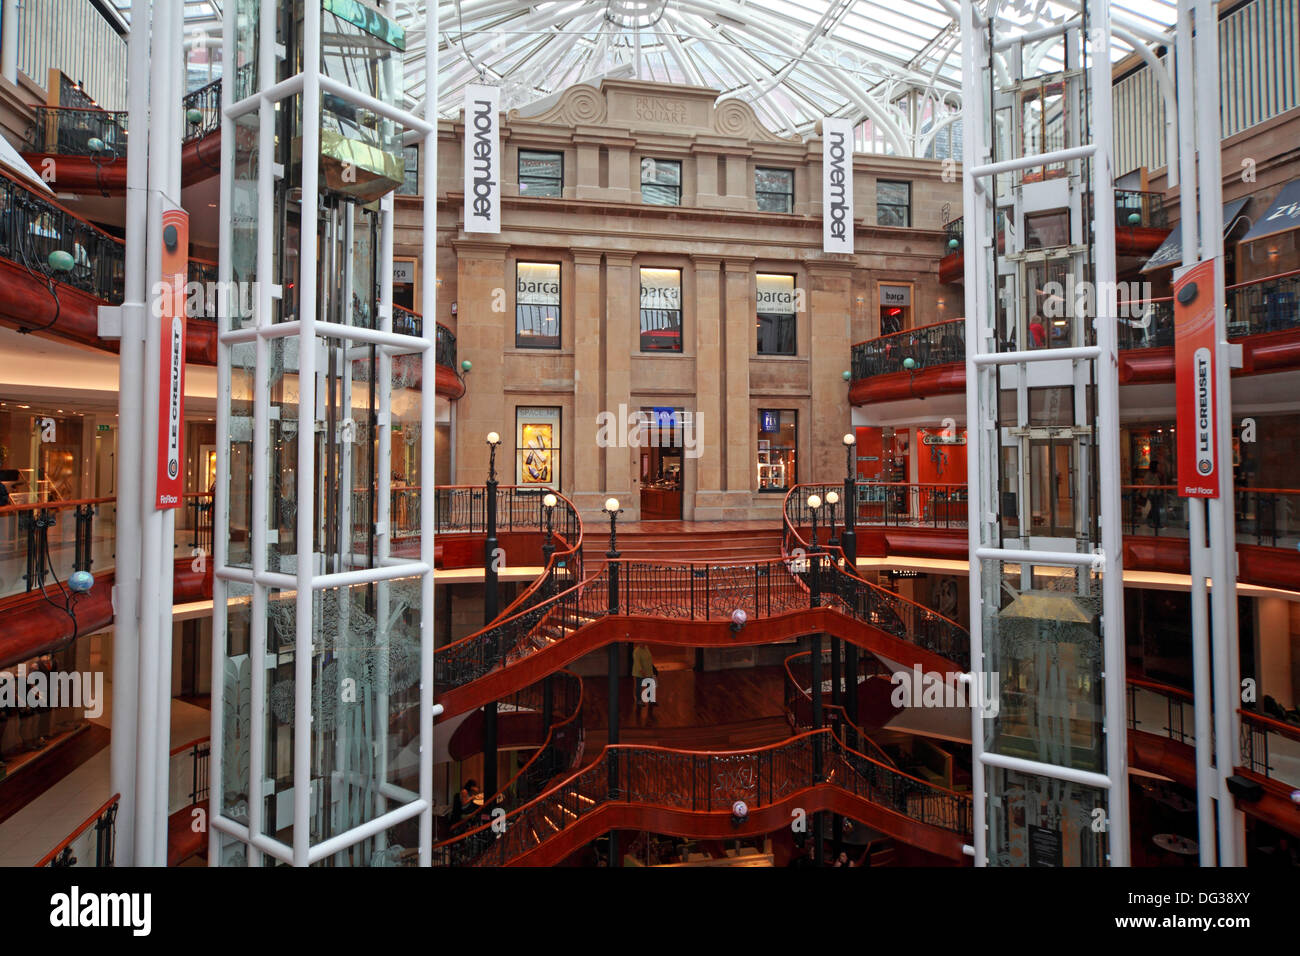 Princes Square Shopping Centre Interior Glasgow City Centre Strathclyde Scotland UK Stock Photo